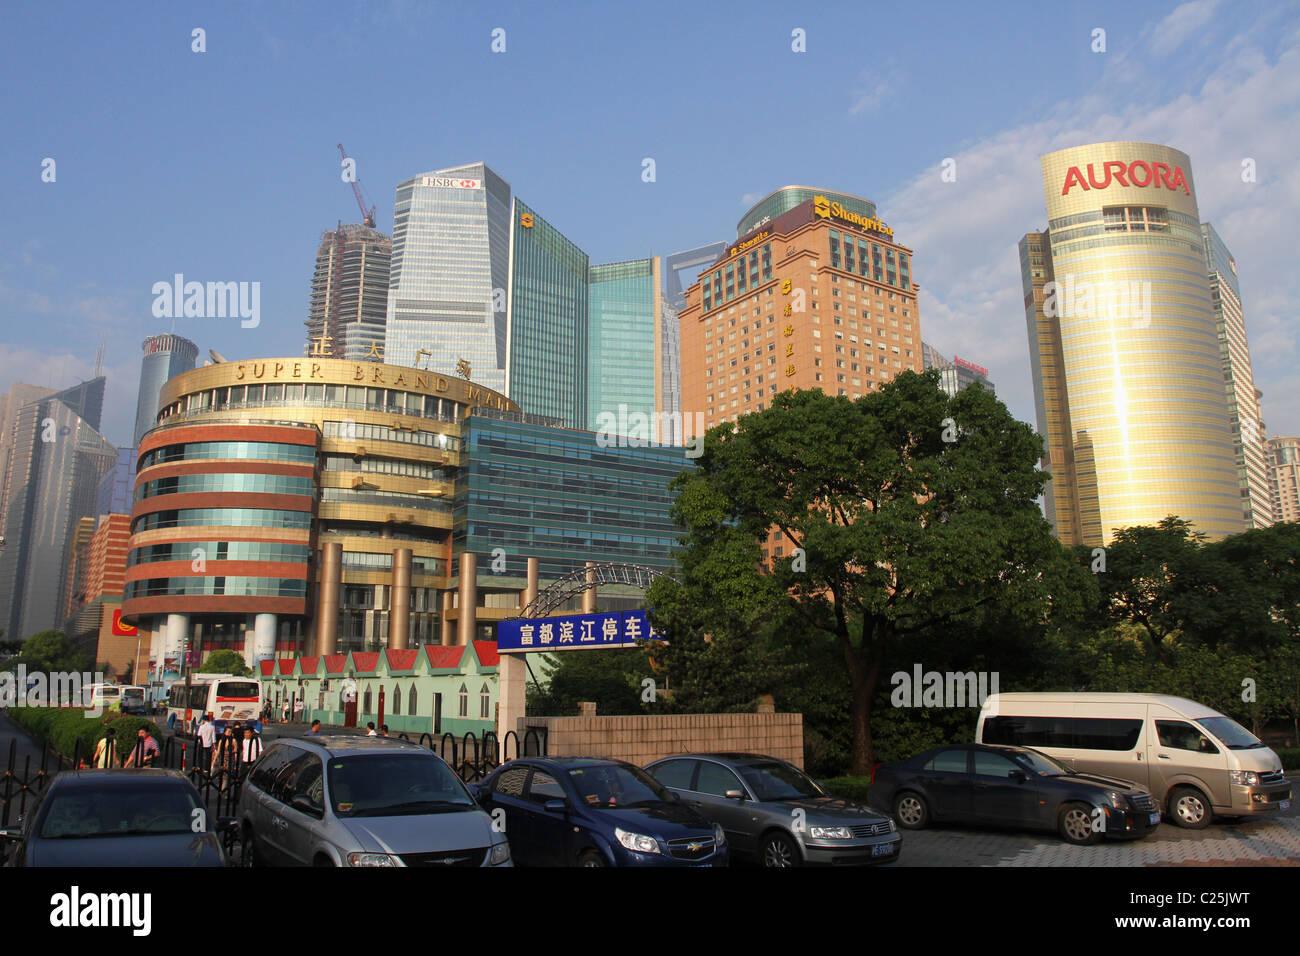 Street View. Pudong, Shanghai, China. Super Brand Mall, HSBC, Shangri-La, Aurora, buildings visible. - Stock Image